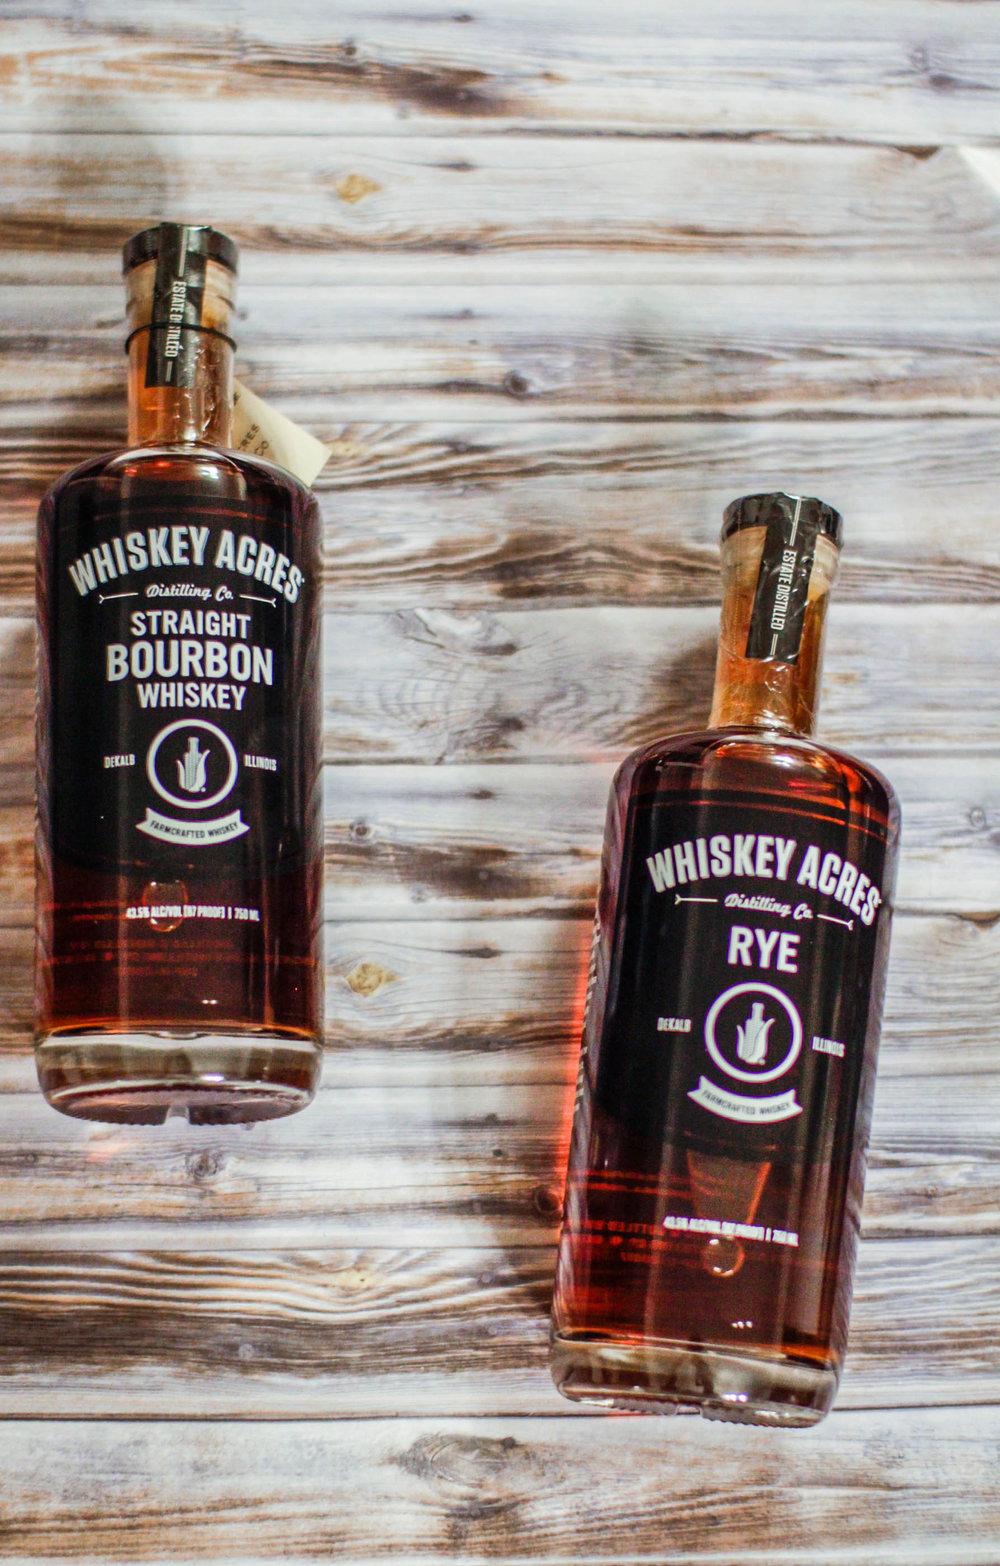 Whiskey Acres Chicago